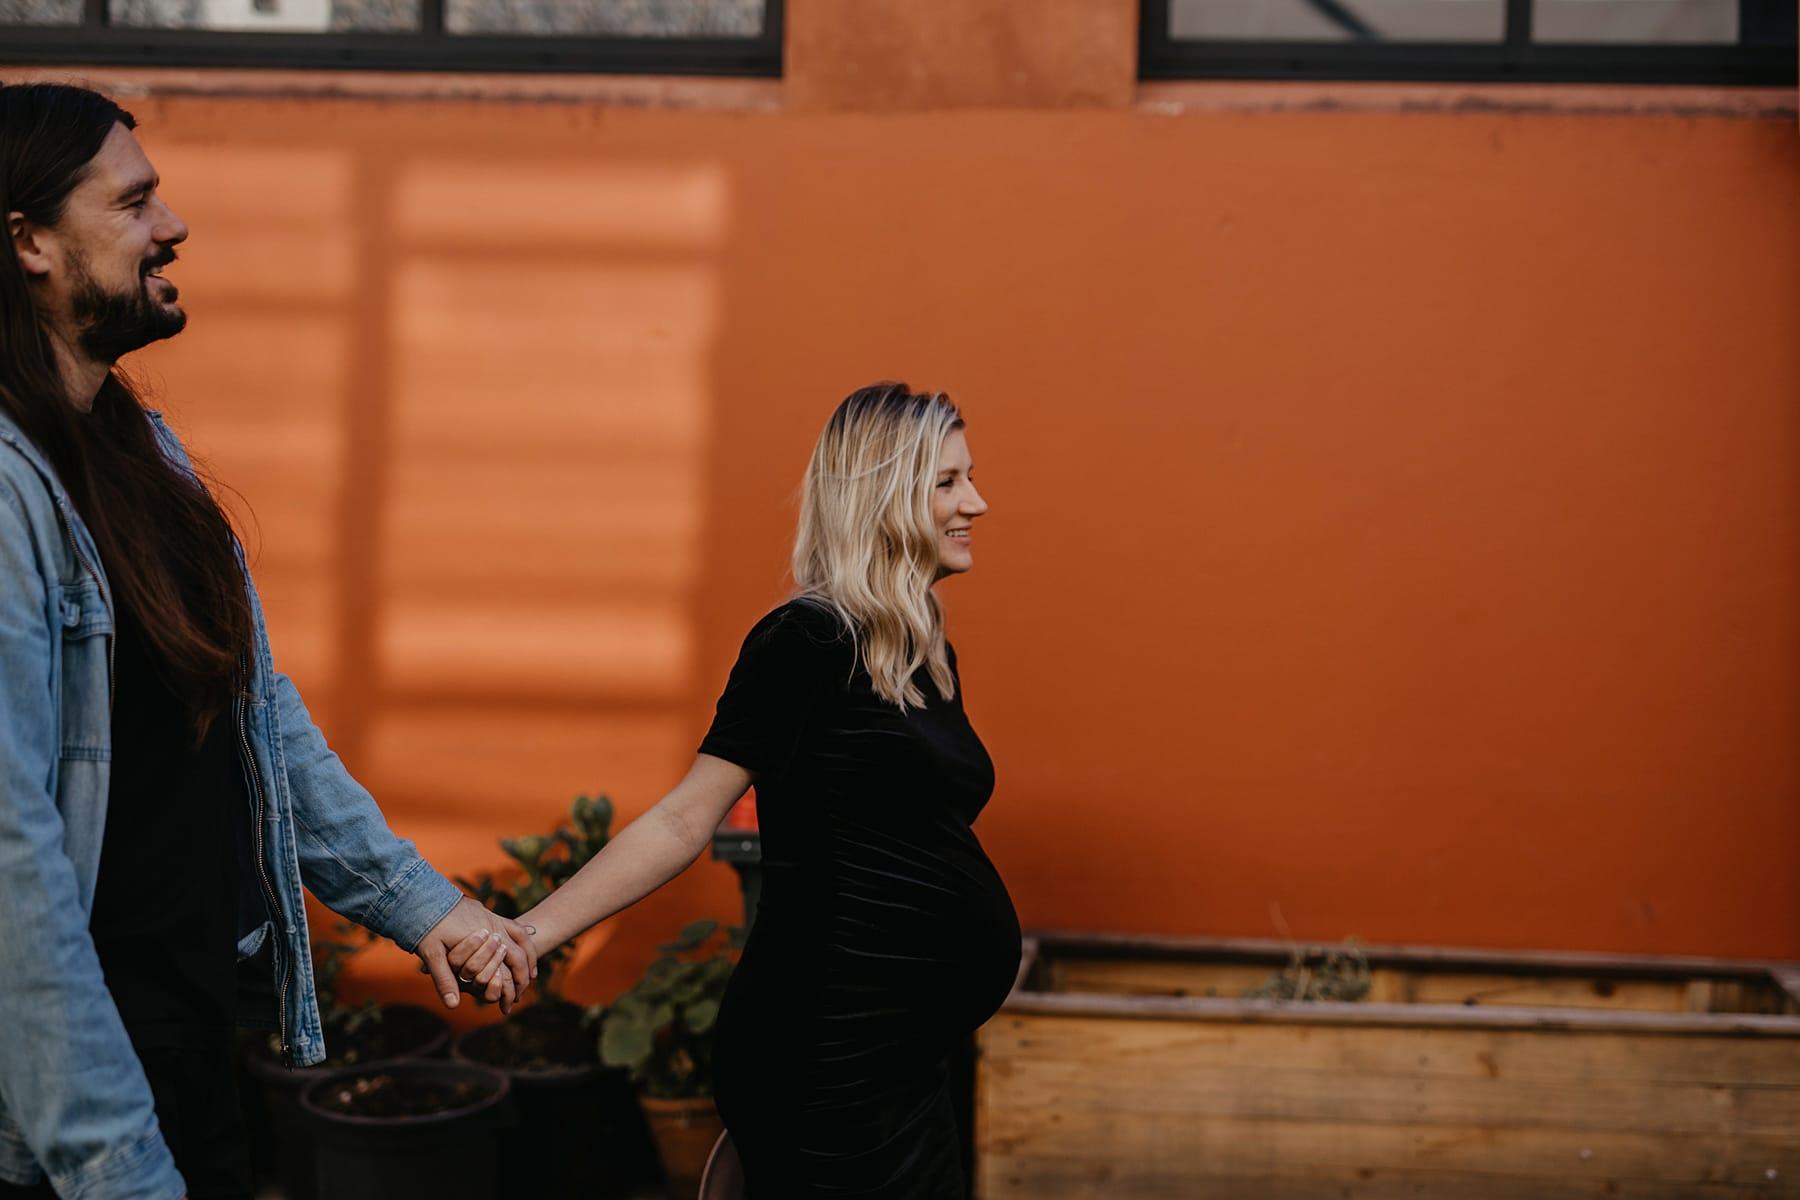 maternity-maternityphotography-lovers-sutherlandshirematernityphotographyer-sydneymaternityphotographer-babybump0028